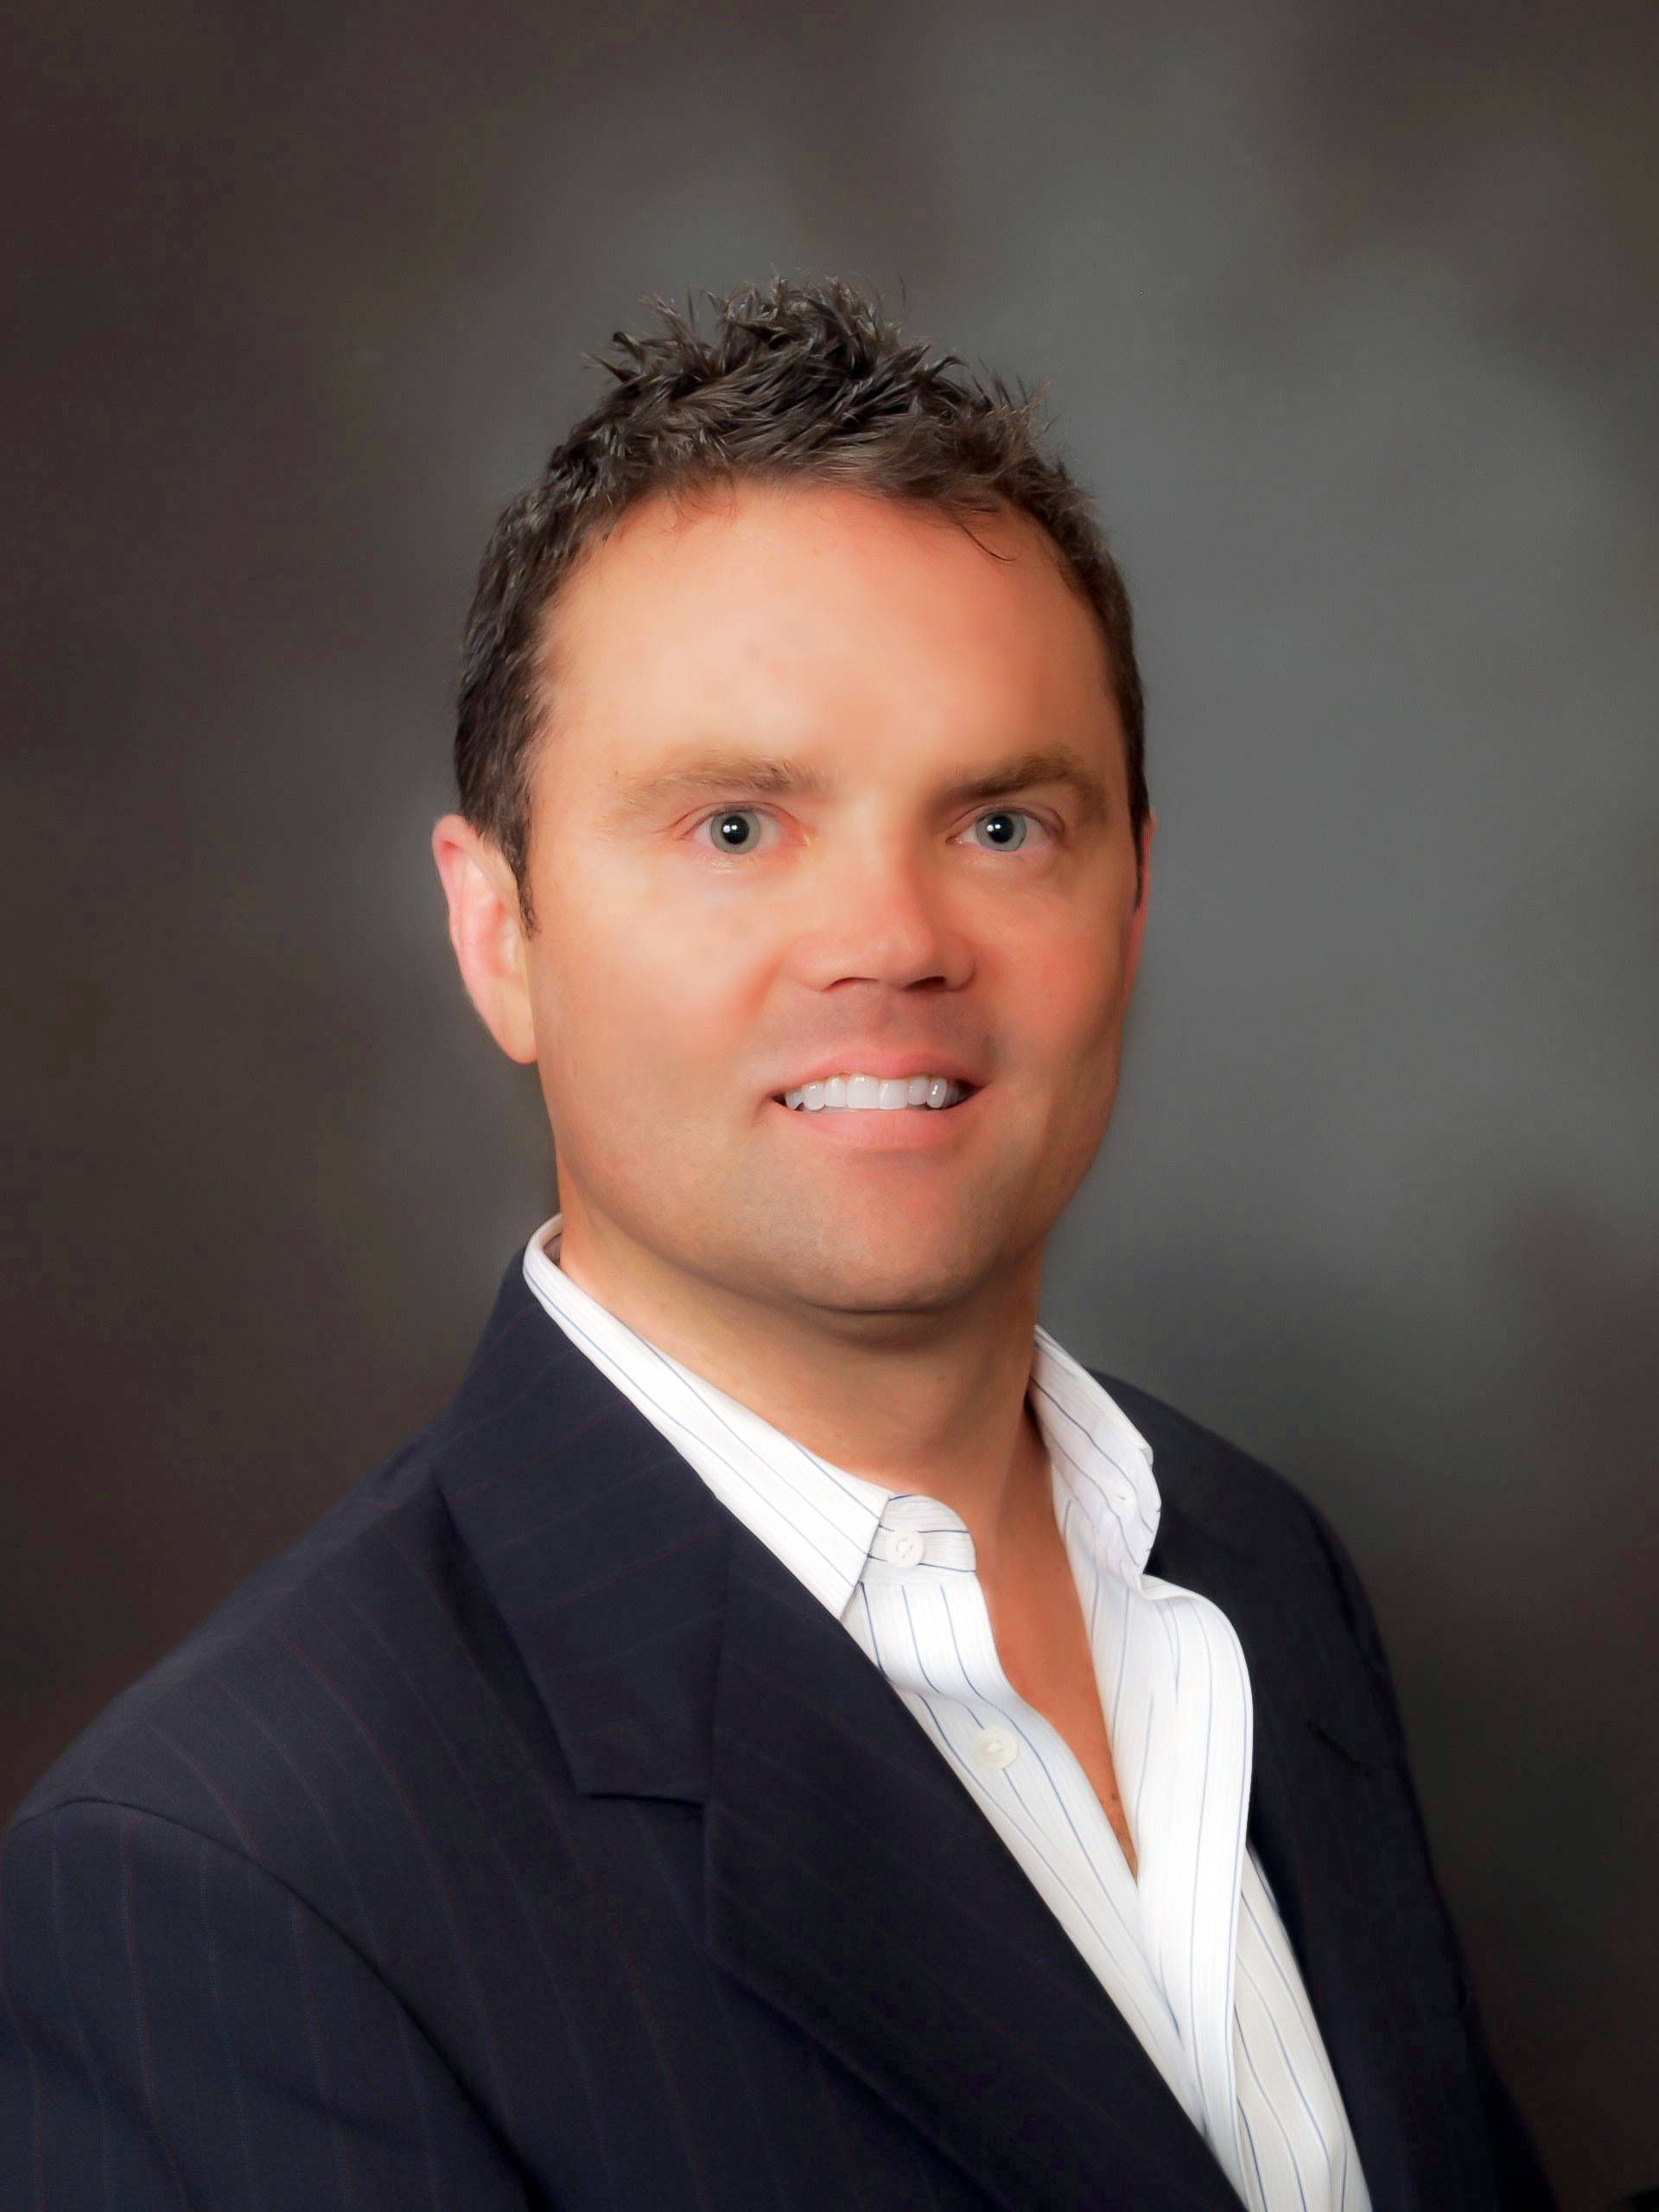 Chad Presnell